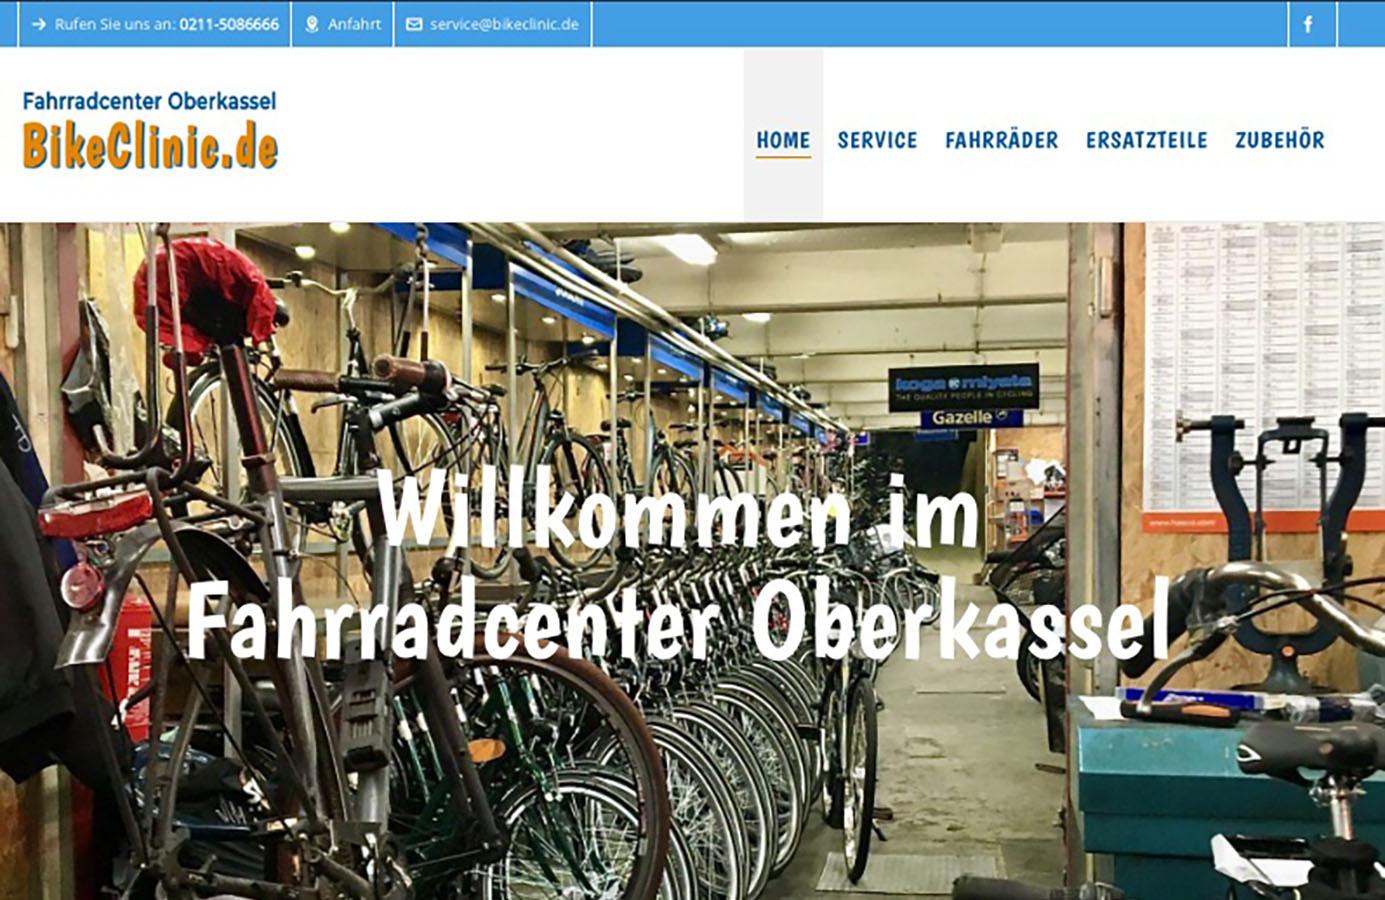 Bikeclinic Düsseldorf oberkassel Homepage